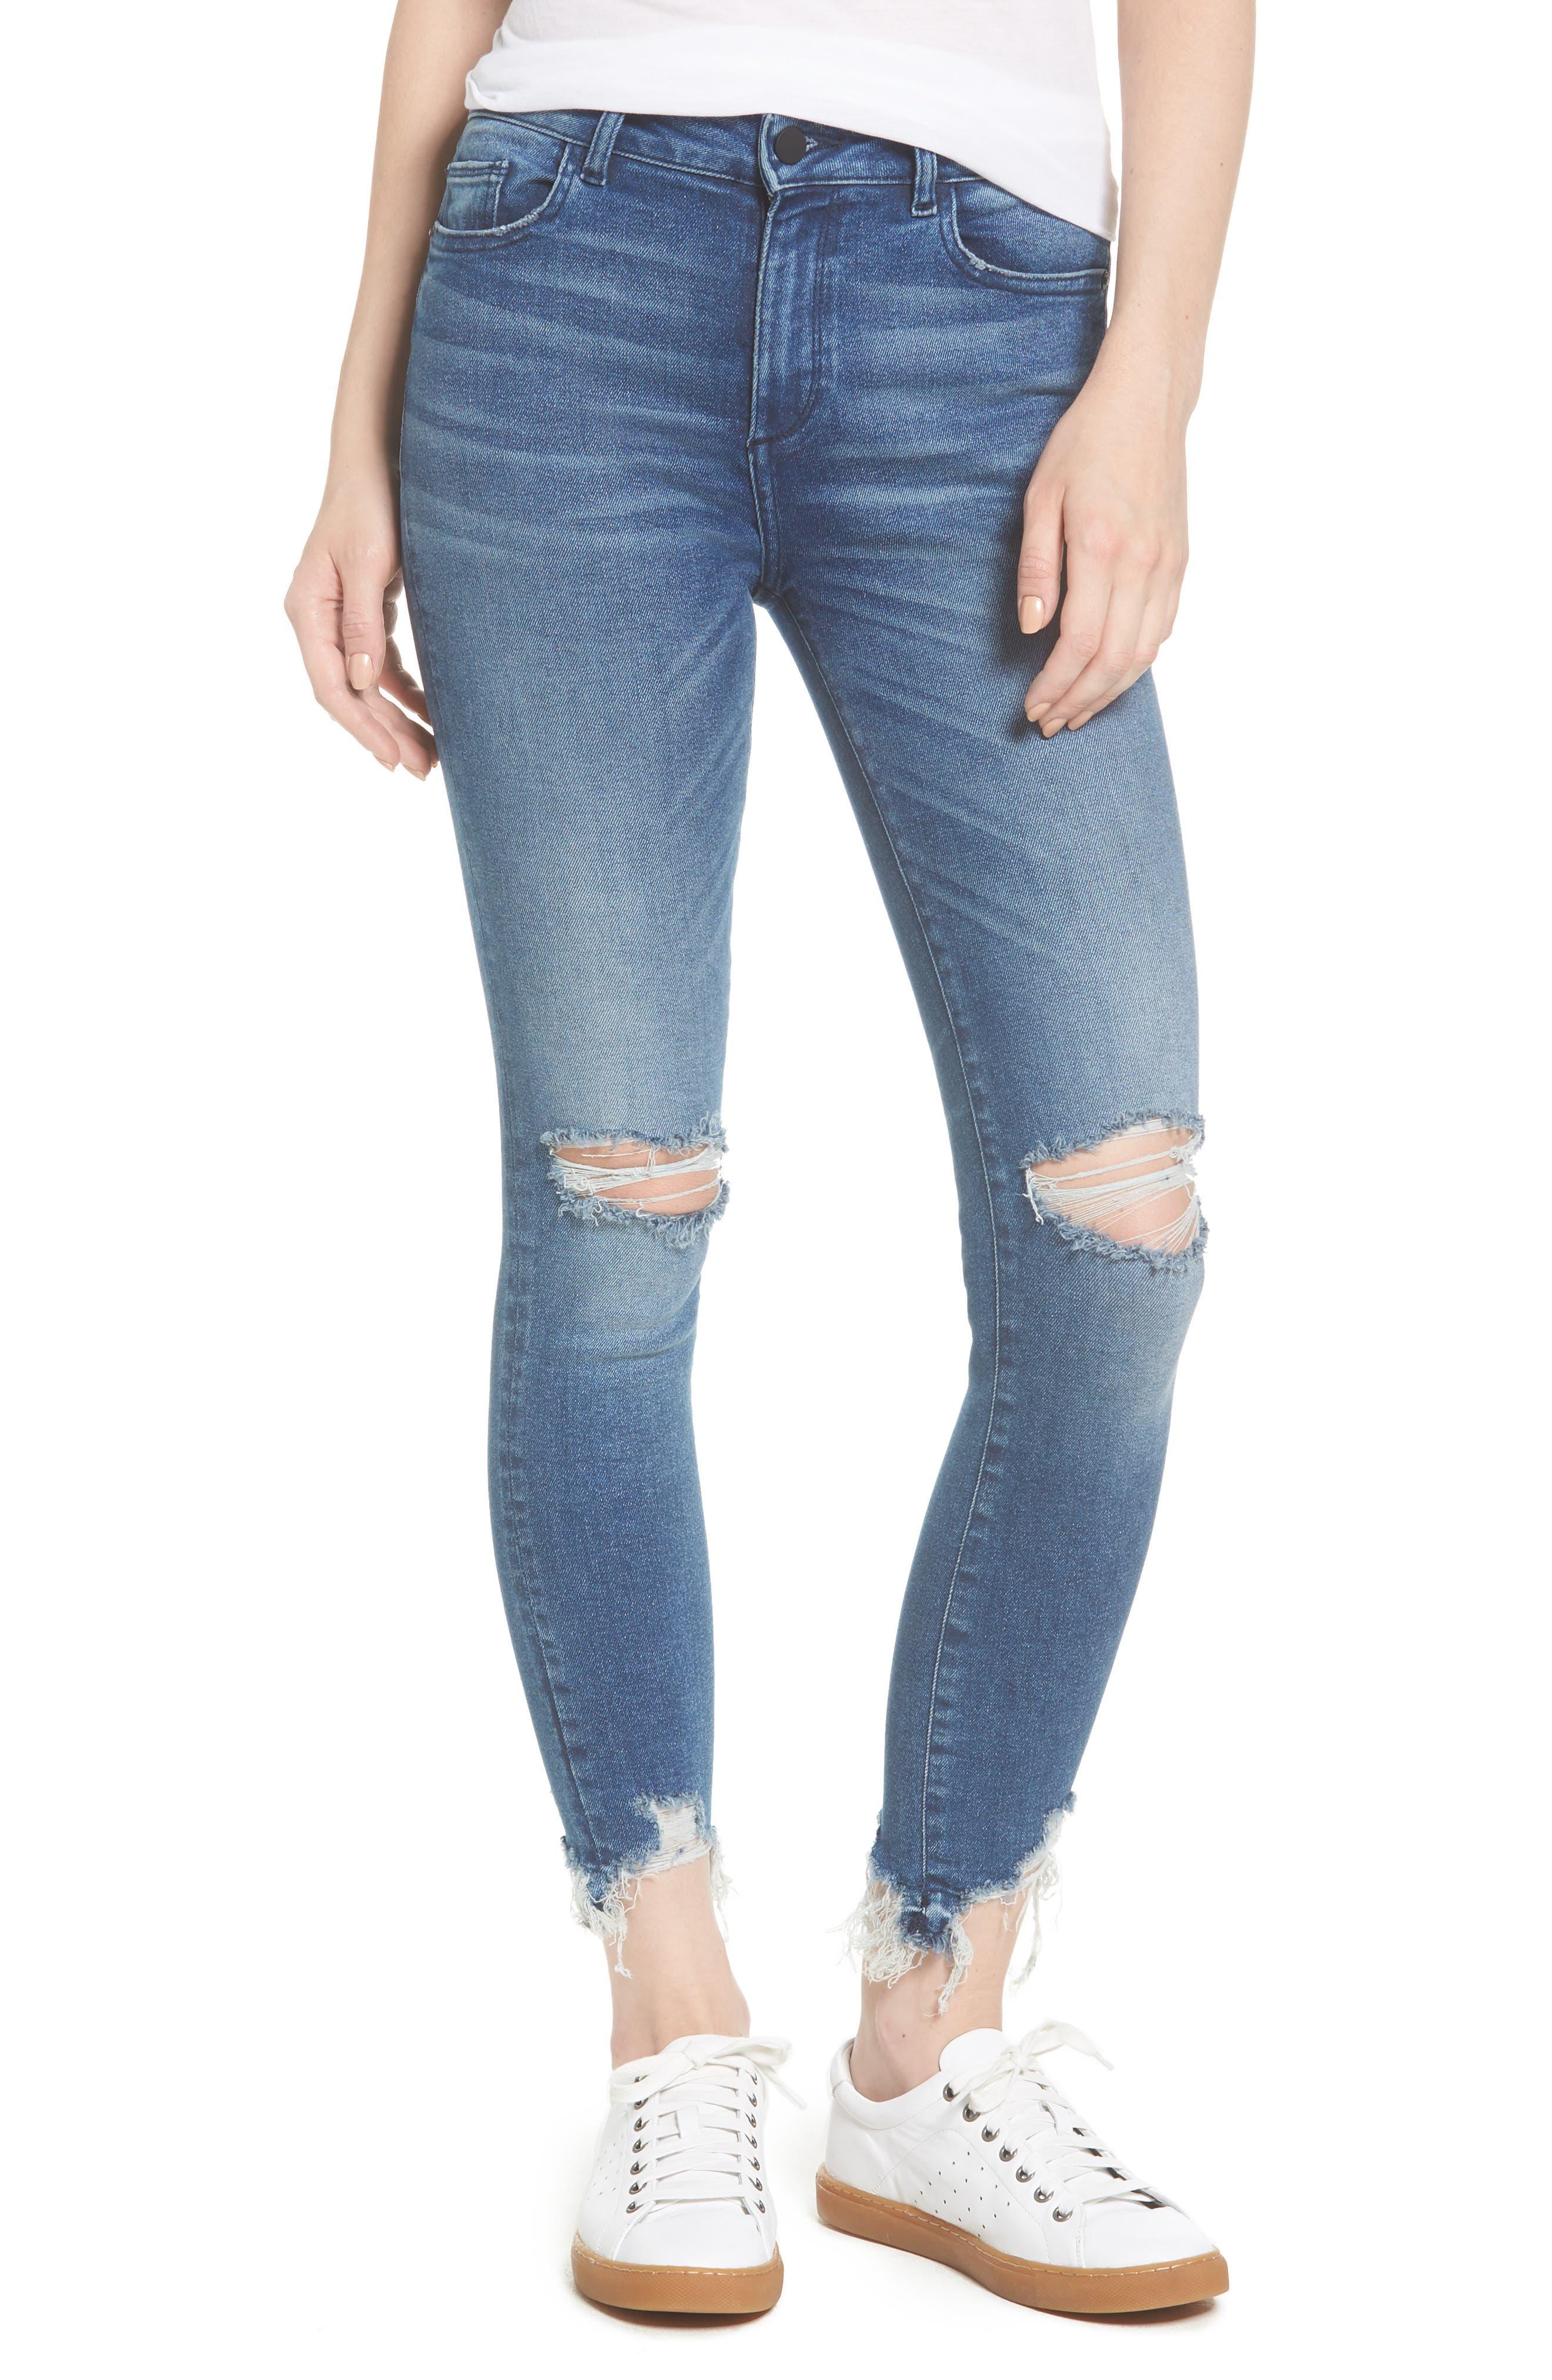 Farrow Instaslim High Waist Ankle Skinny Jeans,                             Main thumbnail 1, color,                             430